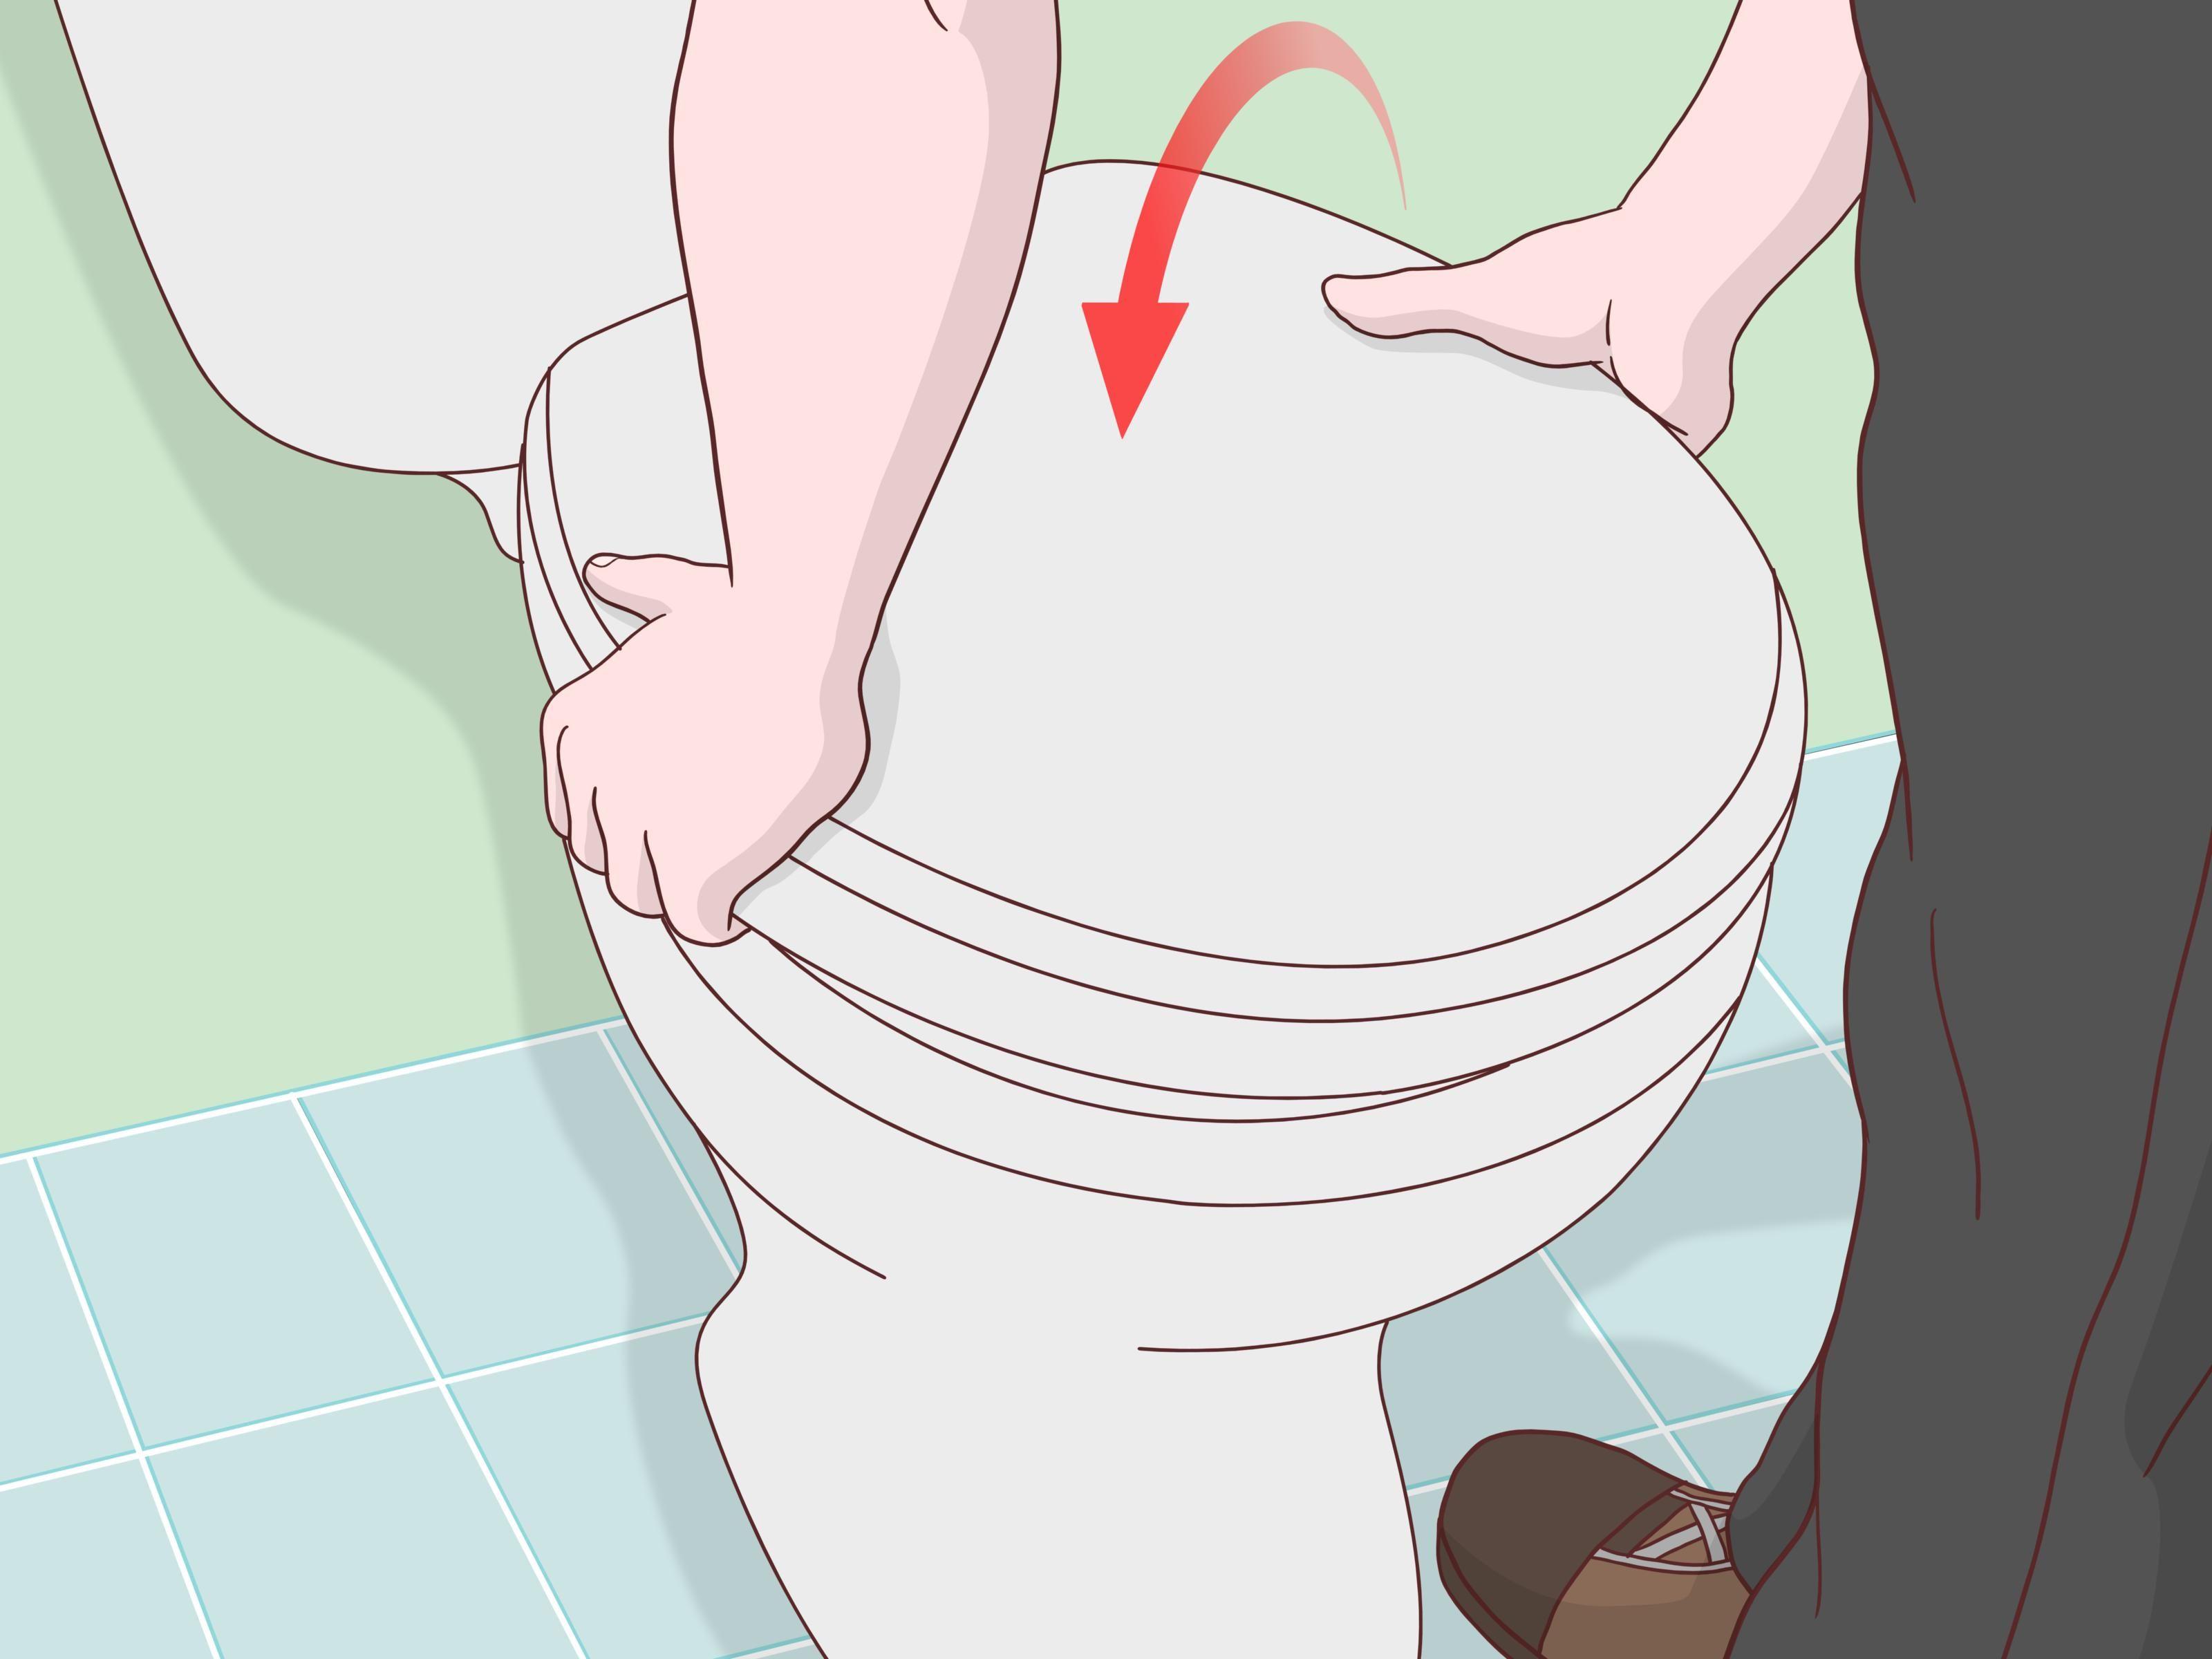 Fix A Loose Toilet Seat With Images Toilet Seat Toilet Toilet Bowl